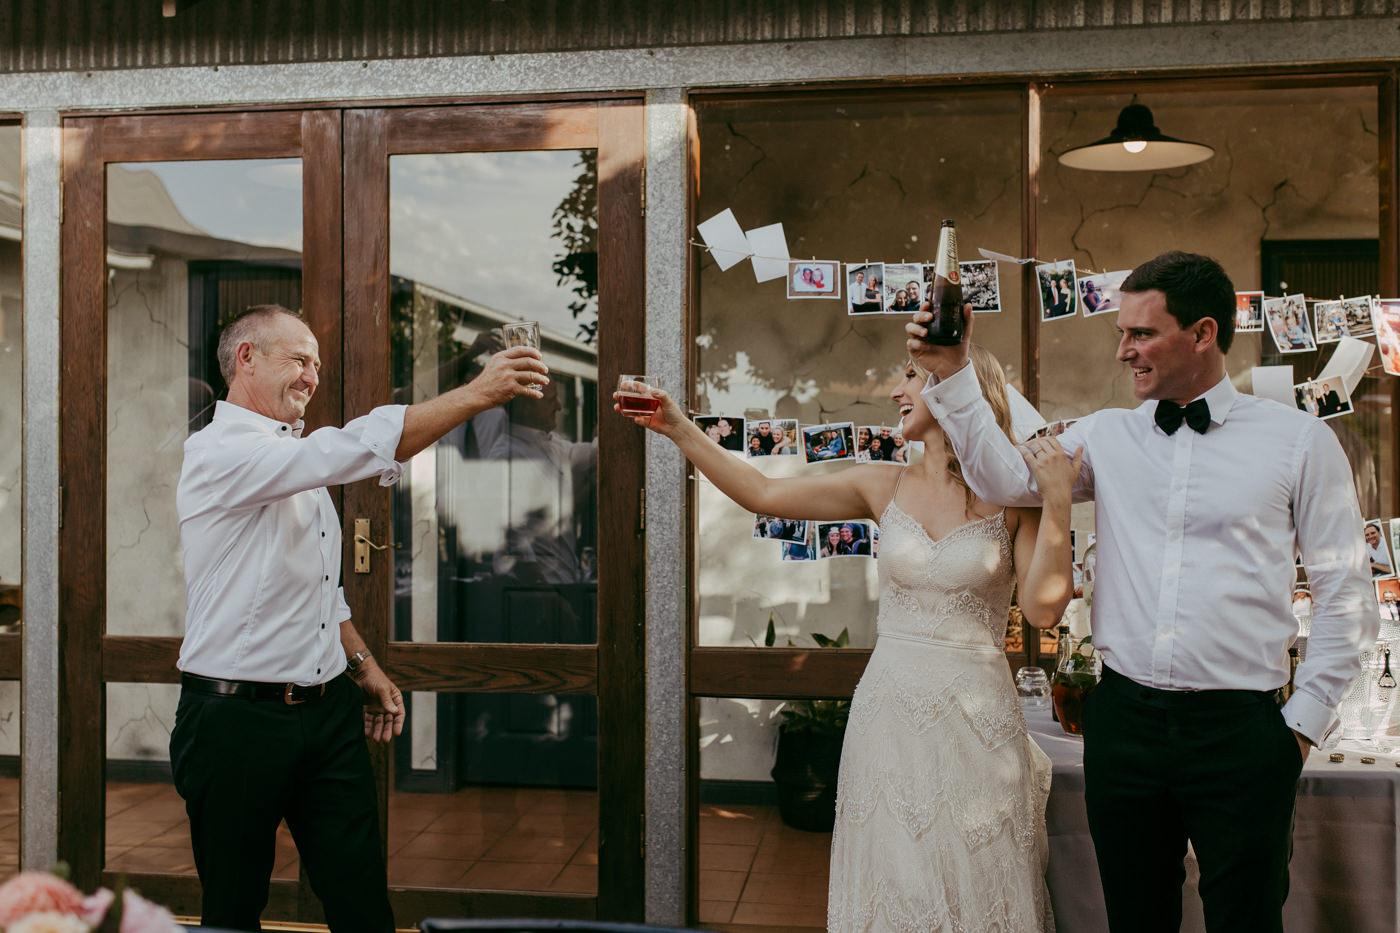 Anthony & Eliet - Wagga Wagga Wedding - Country NSW - Samantha Heather Photography-127.jpg